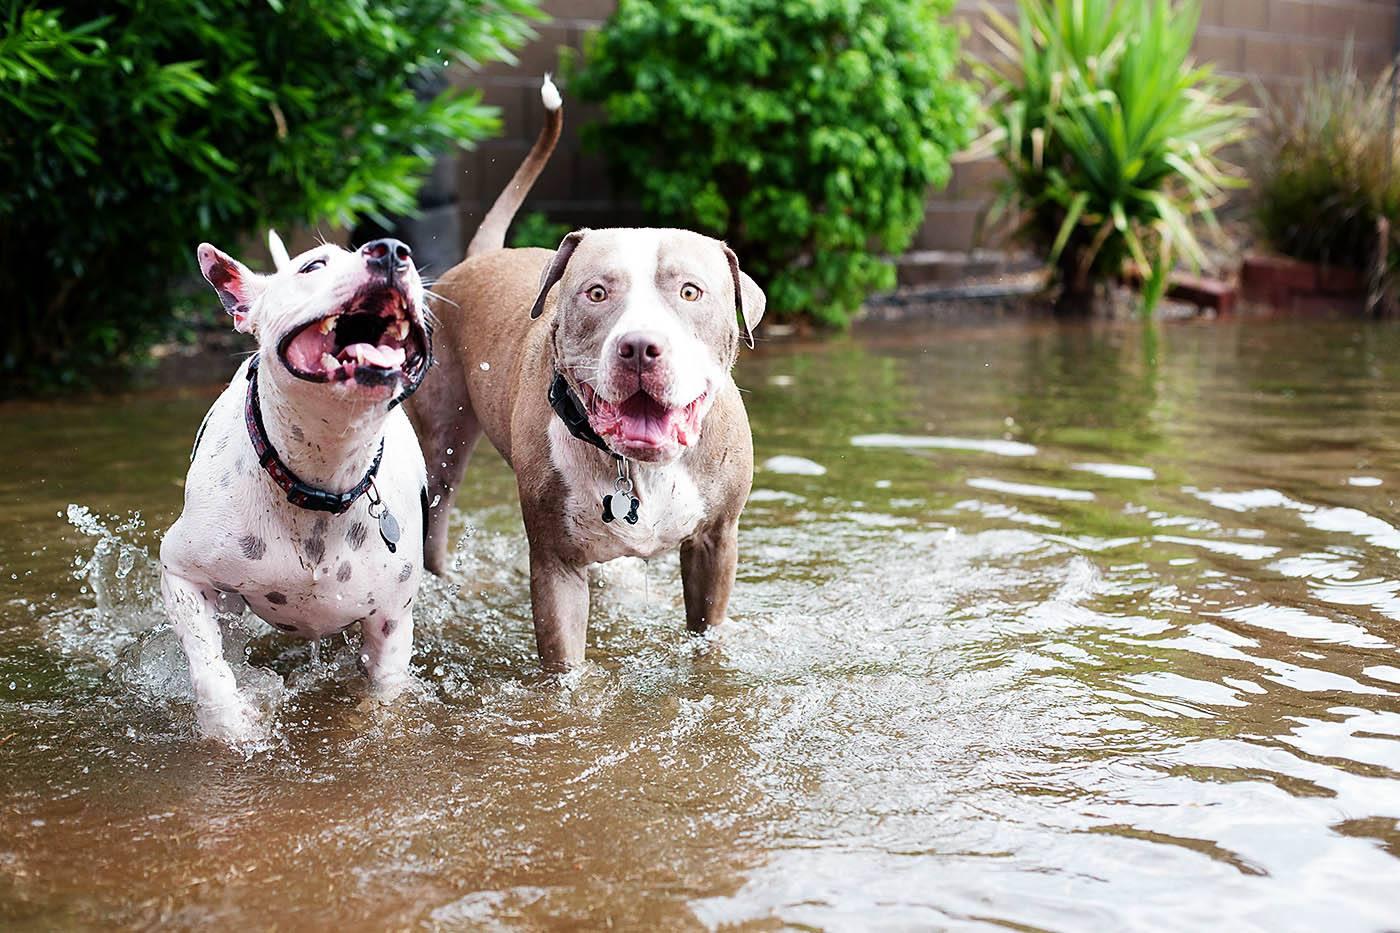 Dogs running through water from Allison Waken